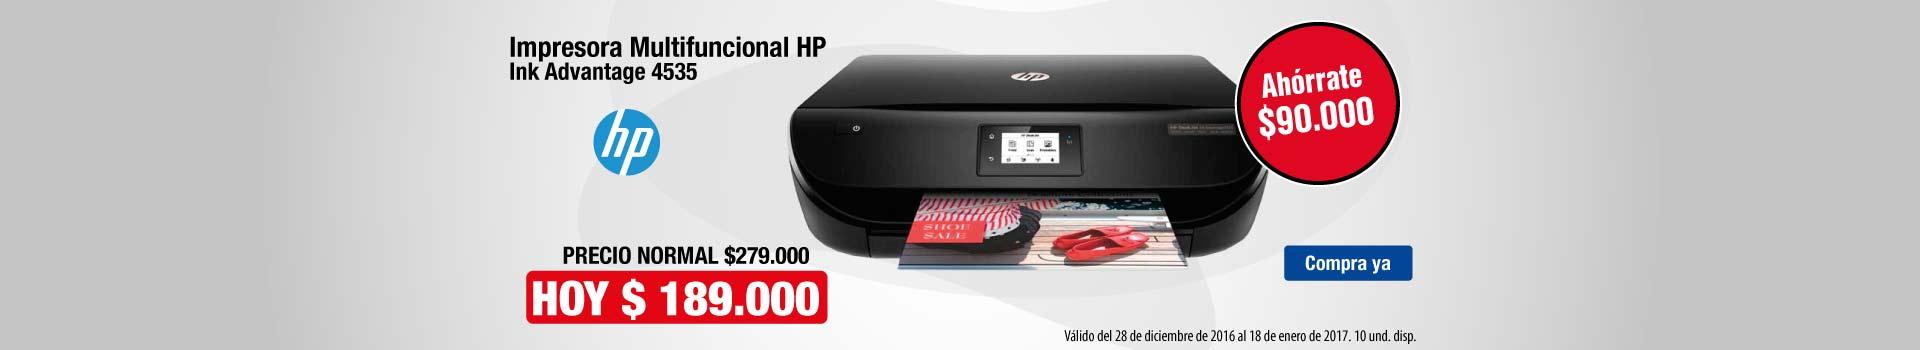 CAT AK y KT - Impresora Multifuncional HP Ink Advantage 4535 - Ene 4